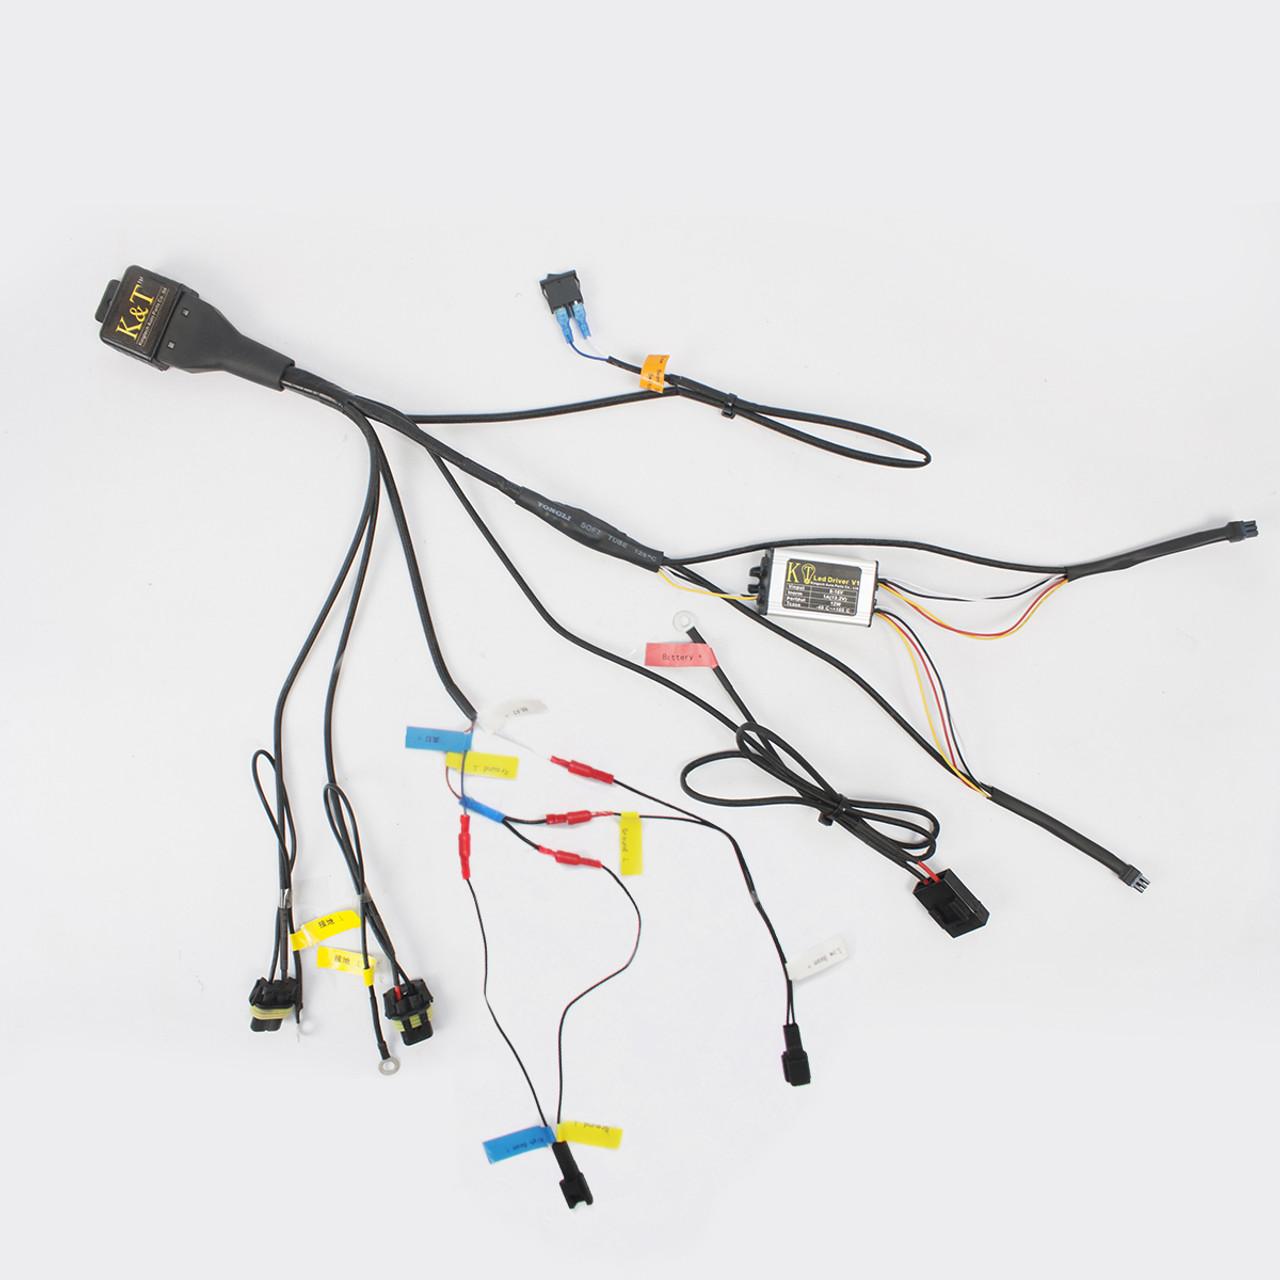 hight resolution of tailor made relay wiring harness for kt kawasaki custom headlight